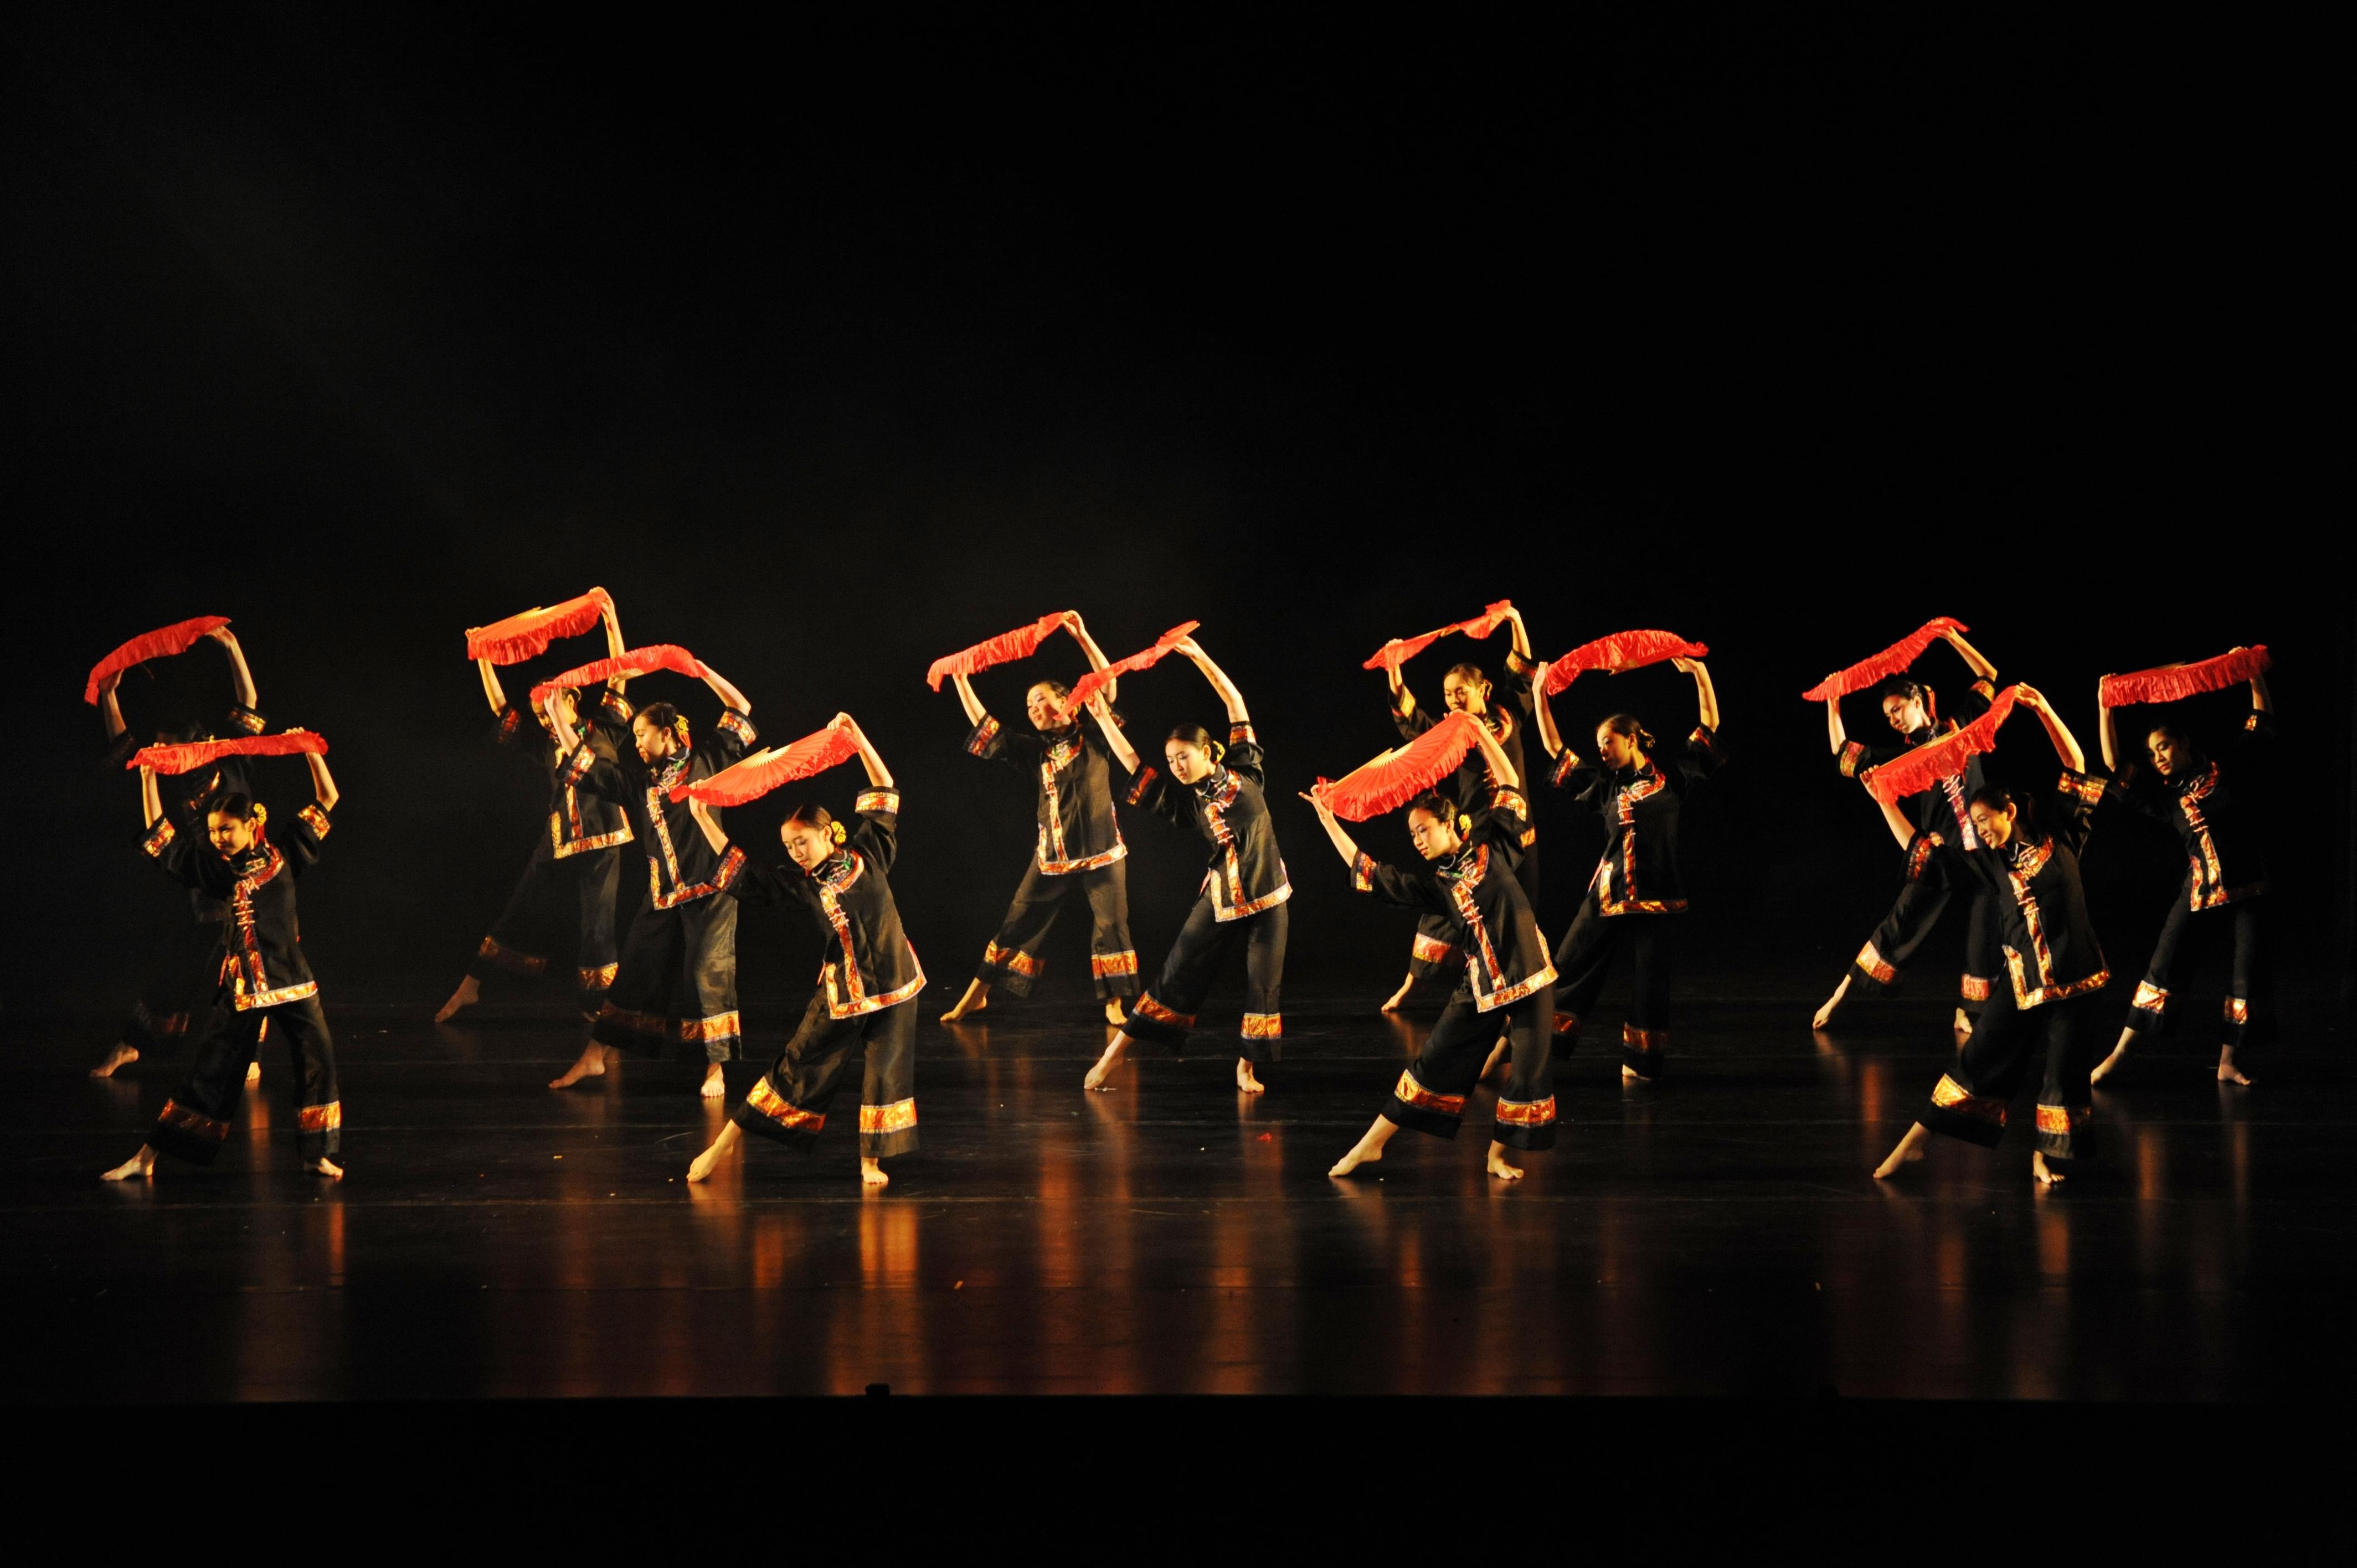 https://www.hkcchoir.org/sites/default/files/youth_dance_2016wu_yuan_chuan_cheng_1.jpg